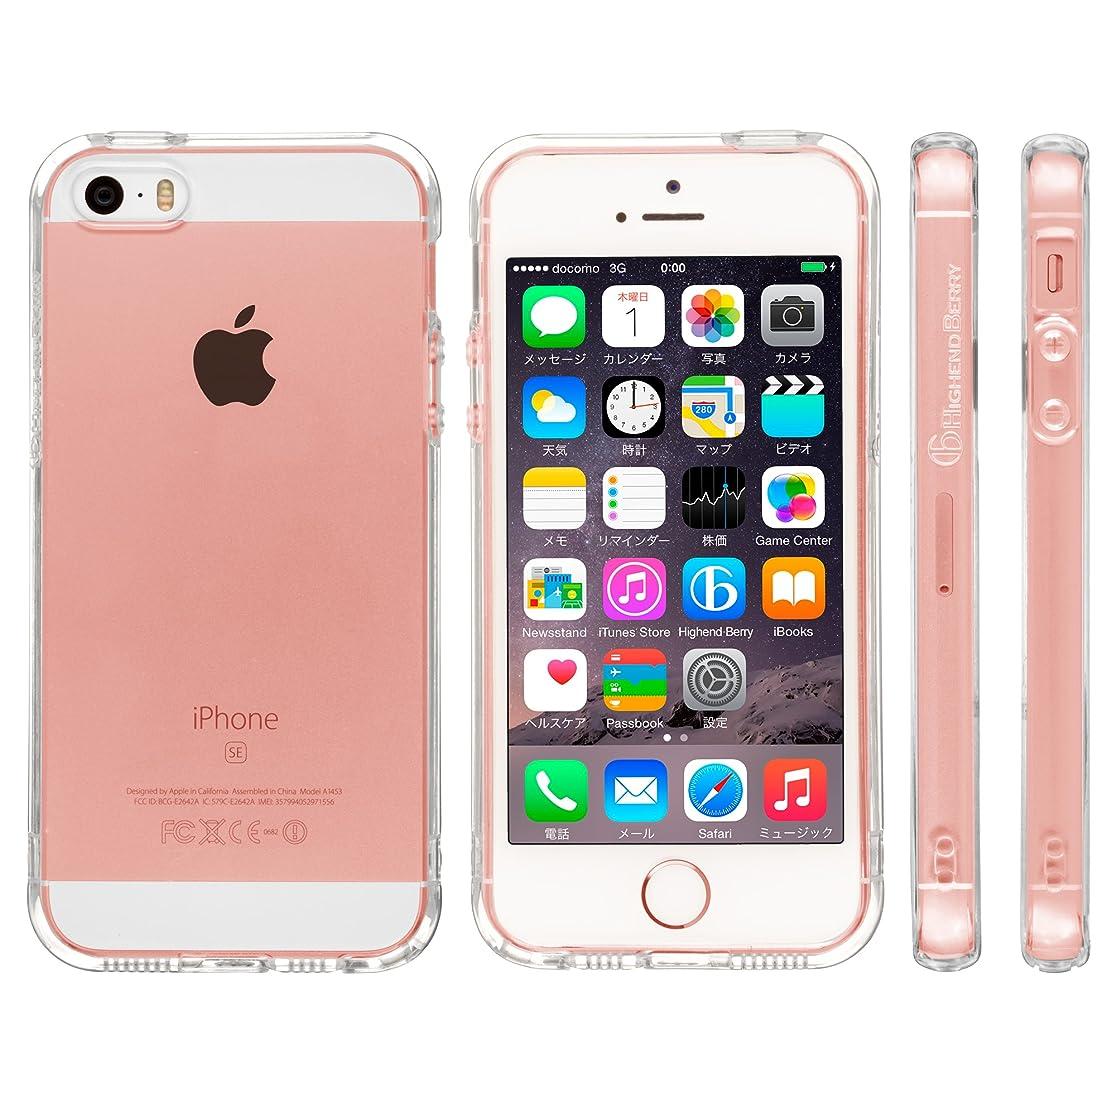 Highend berry 【 iPhone SE / 5s / 5 】 ストラップ ホール 保護キャップ 付き ソフト TPU ケース クリア